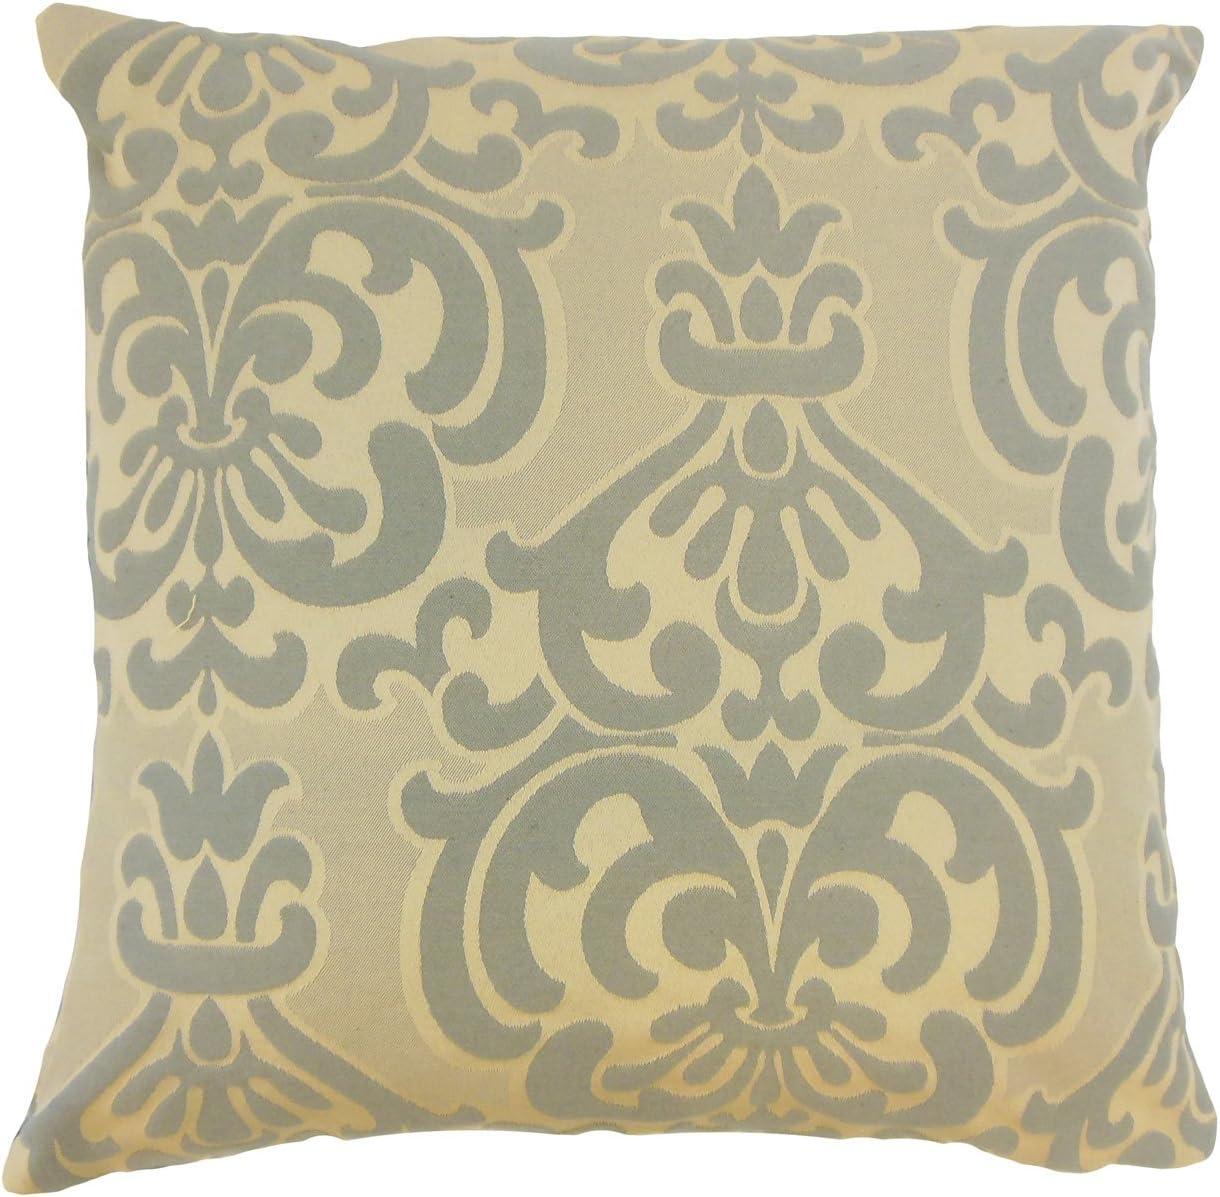 The Pillow Collection Sarane Damask Bedding Sham Truffle Queen//20 x 30